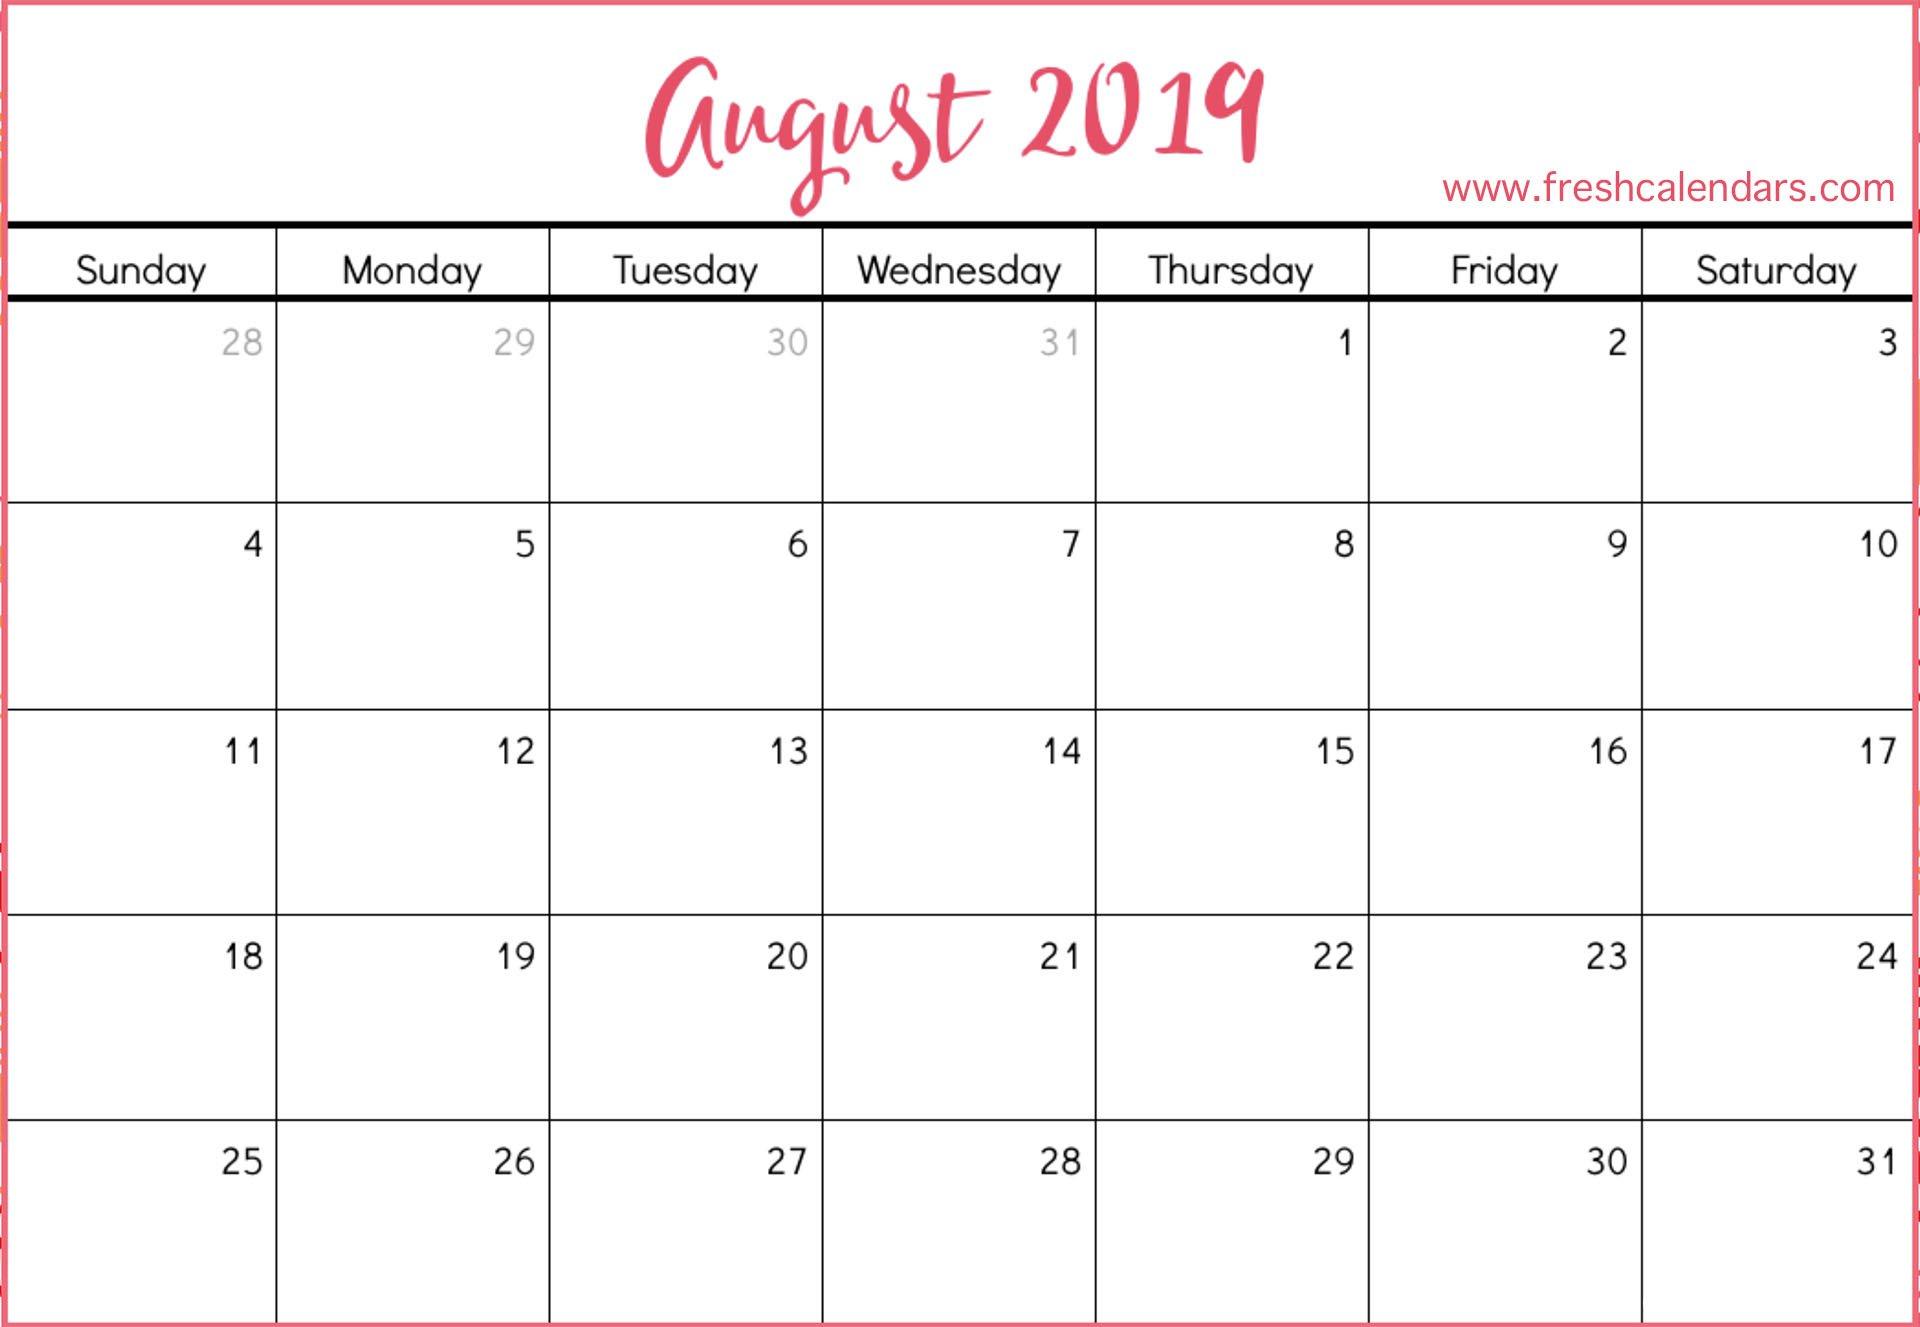 August 2019 Calendar Printable – Fresh Calendars Calendar 2019 August